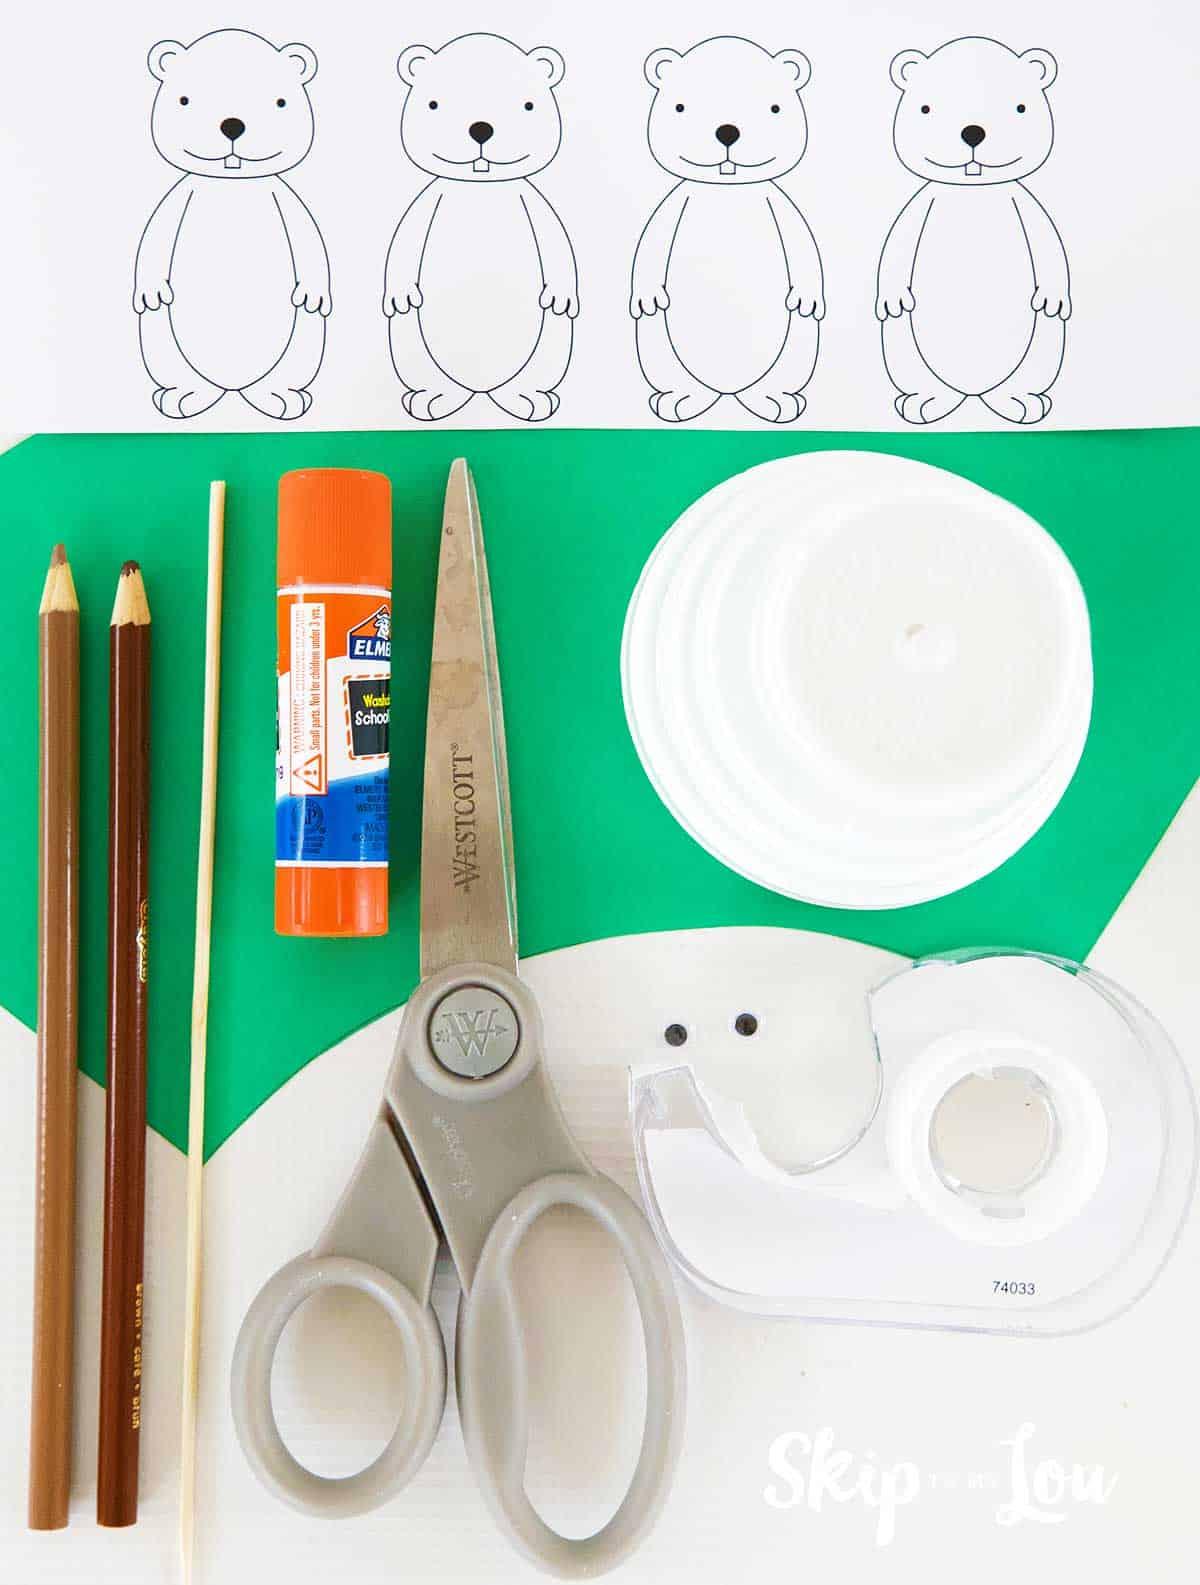 supplies scissors glue sticks colored pencils scissors tape printable groundhogs foam cup